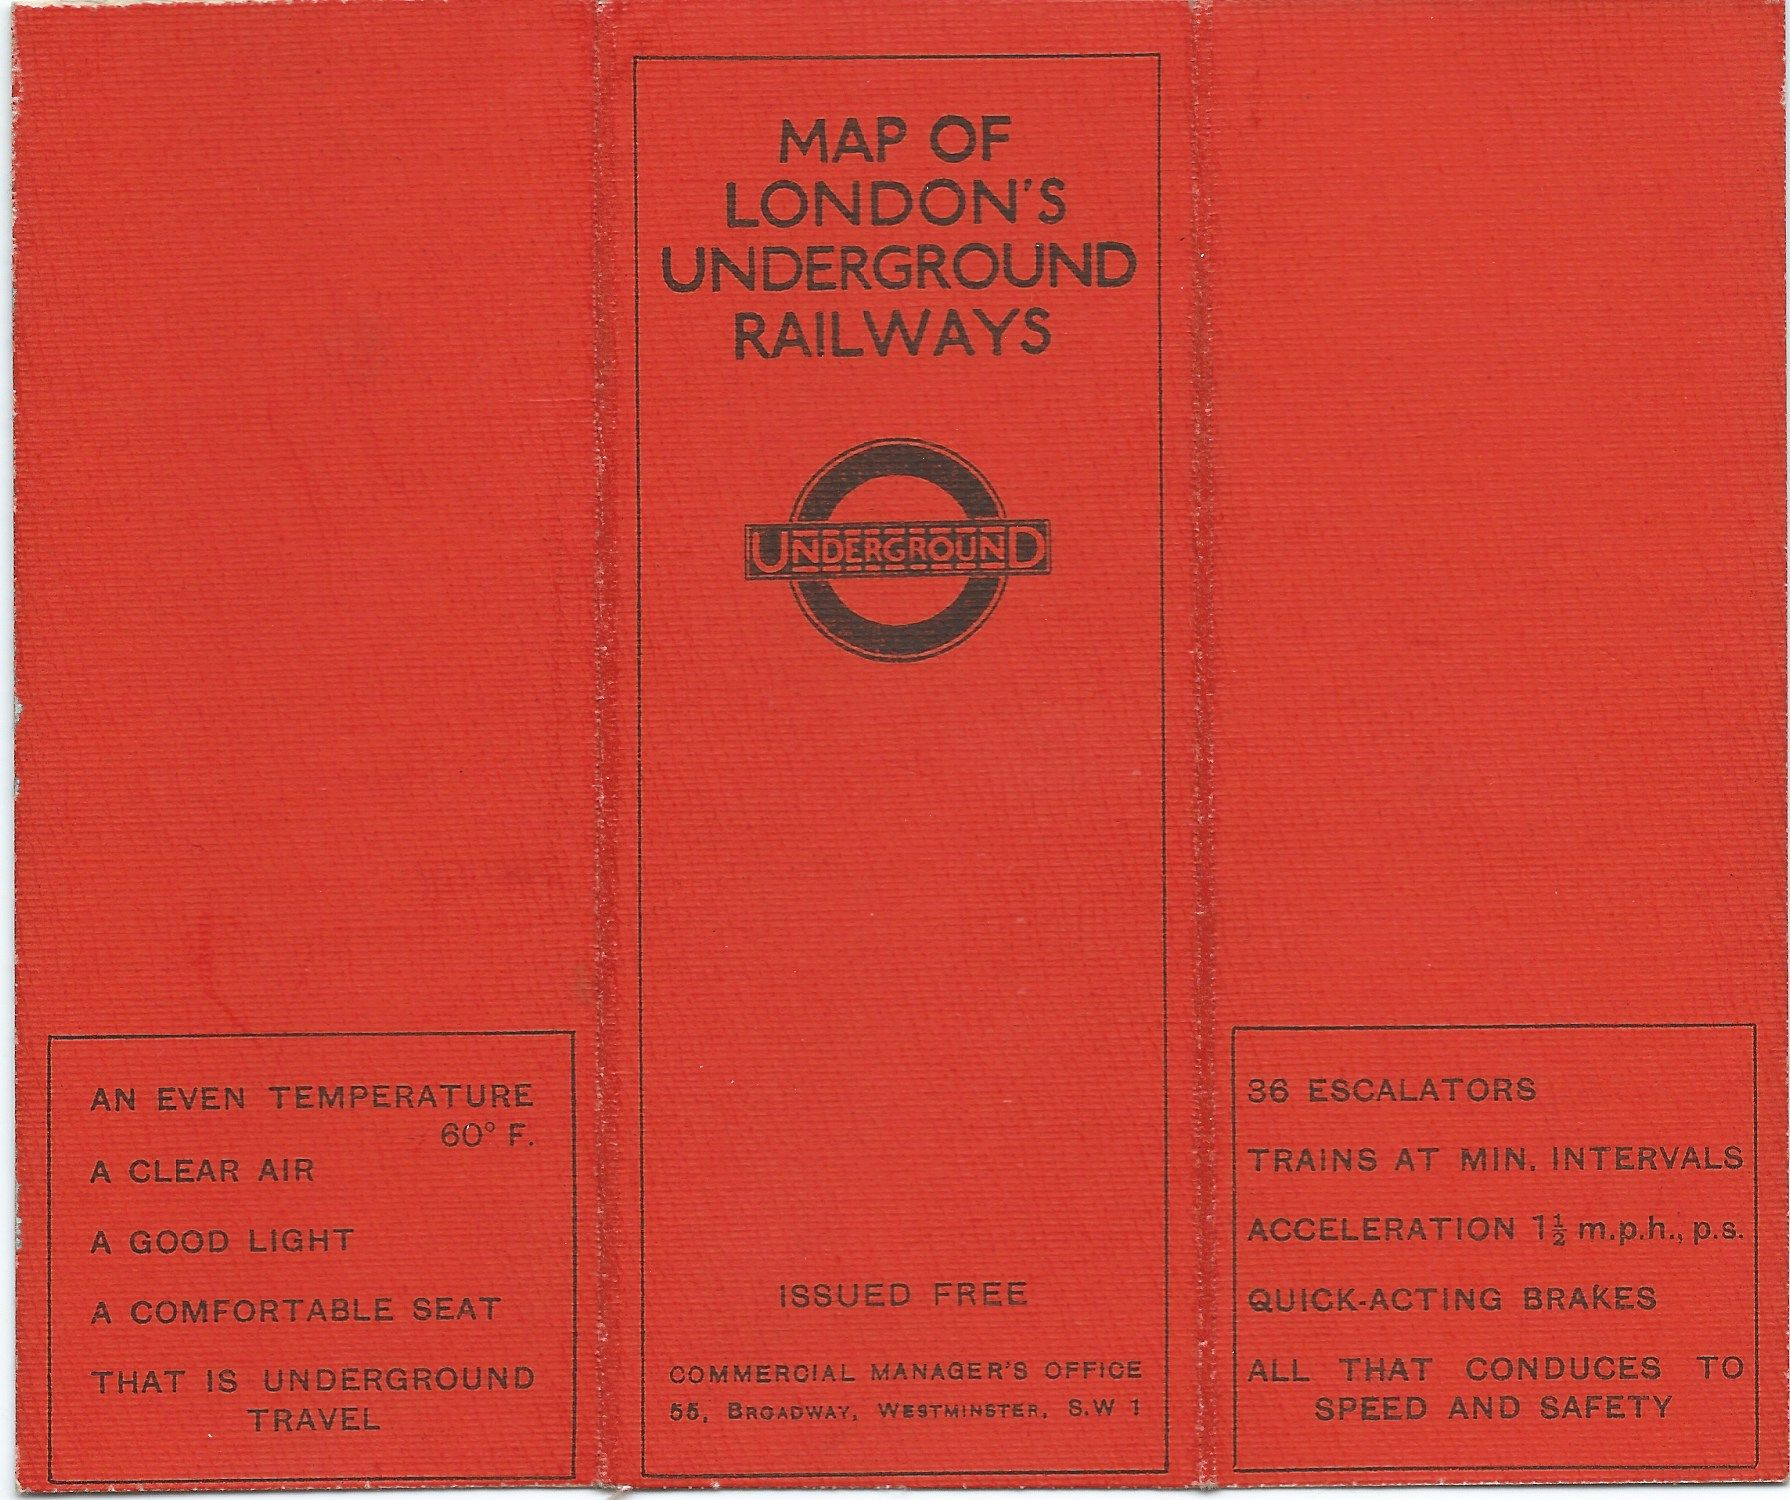 London Underground Railway Map Designed By Fh